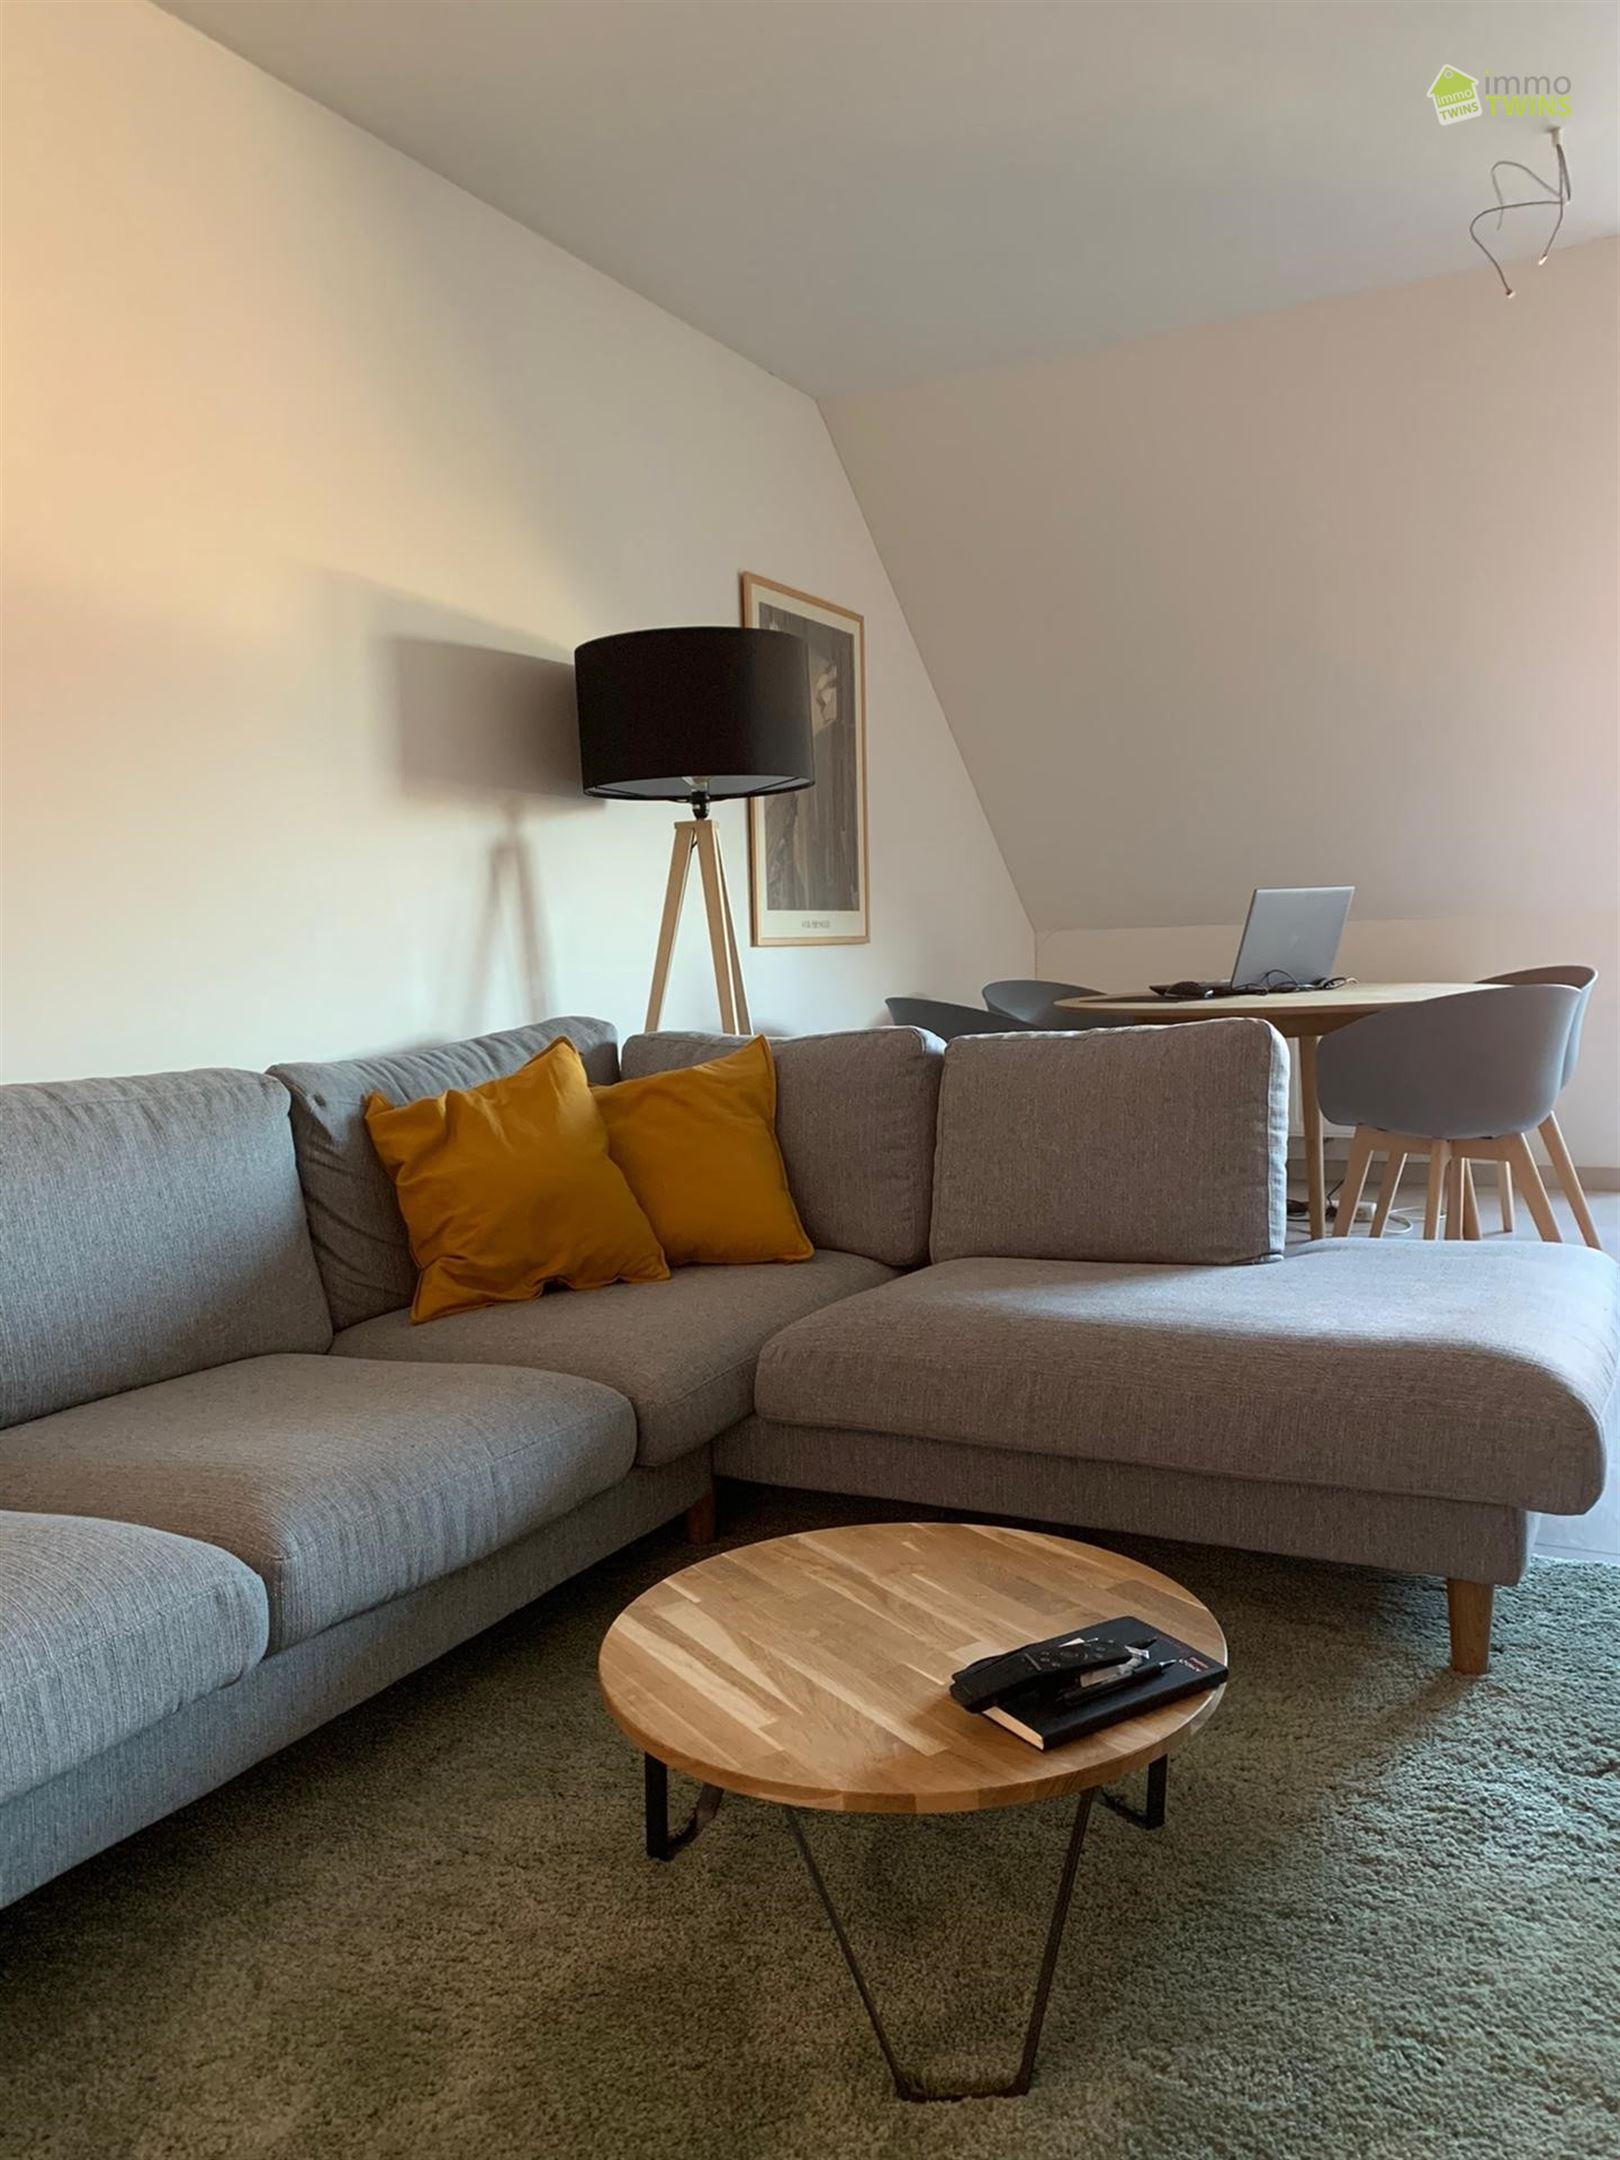 Foto 22 : Appartement te 9200 BAASRODE (België) - Prijs € 660